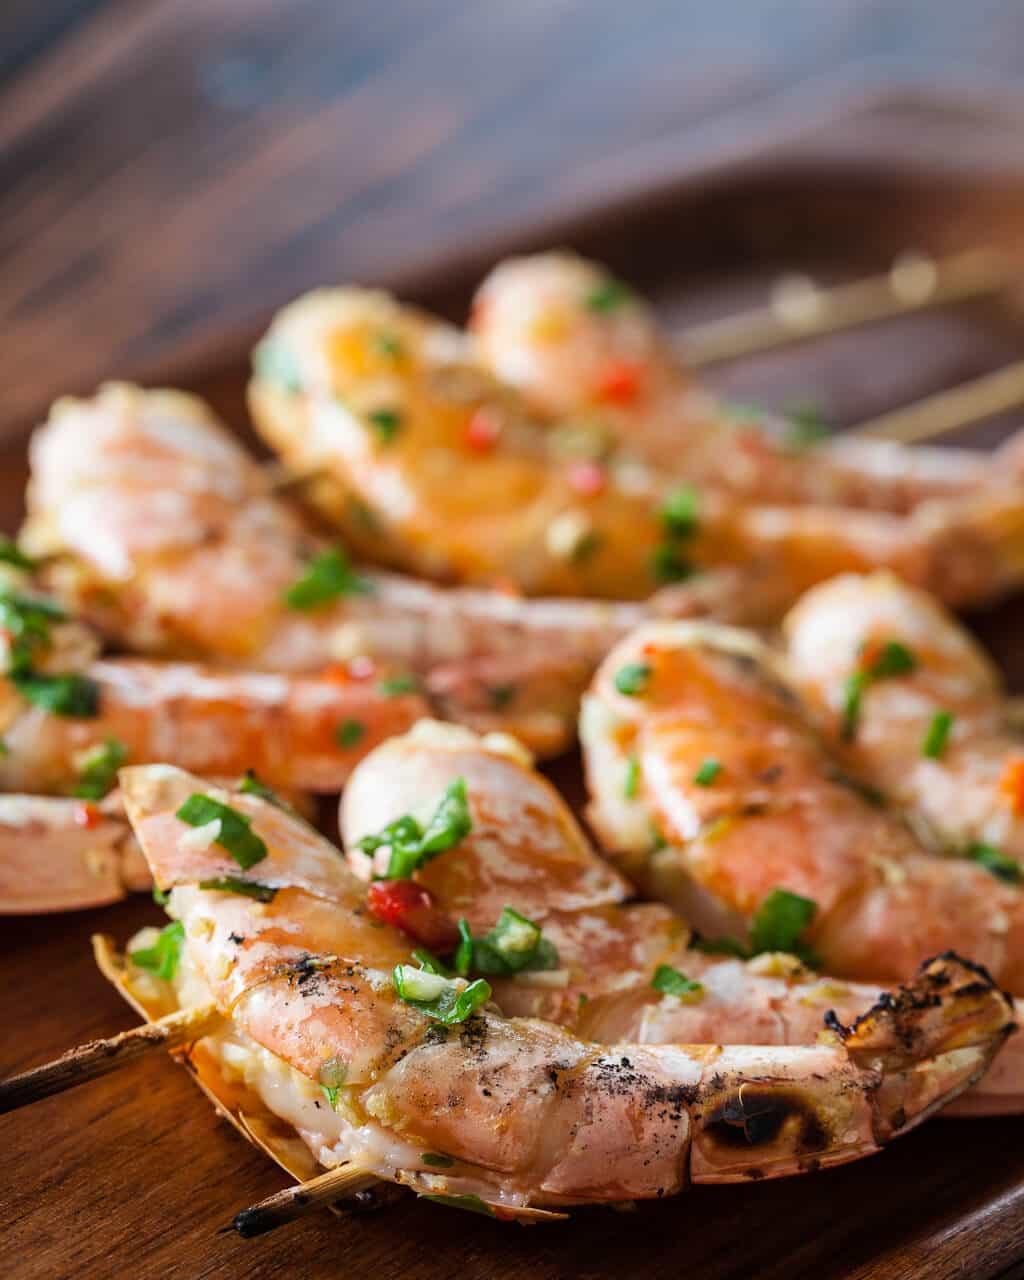 On shrimp barbeque the asian kraft